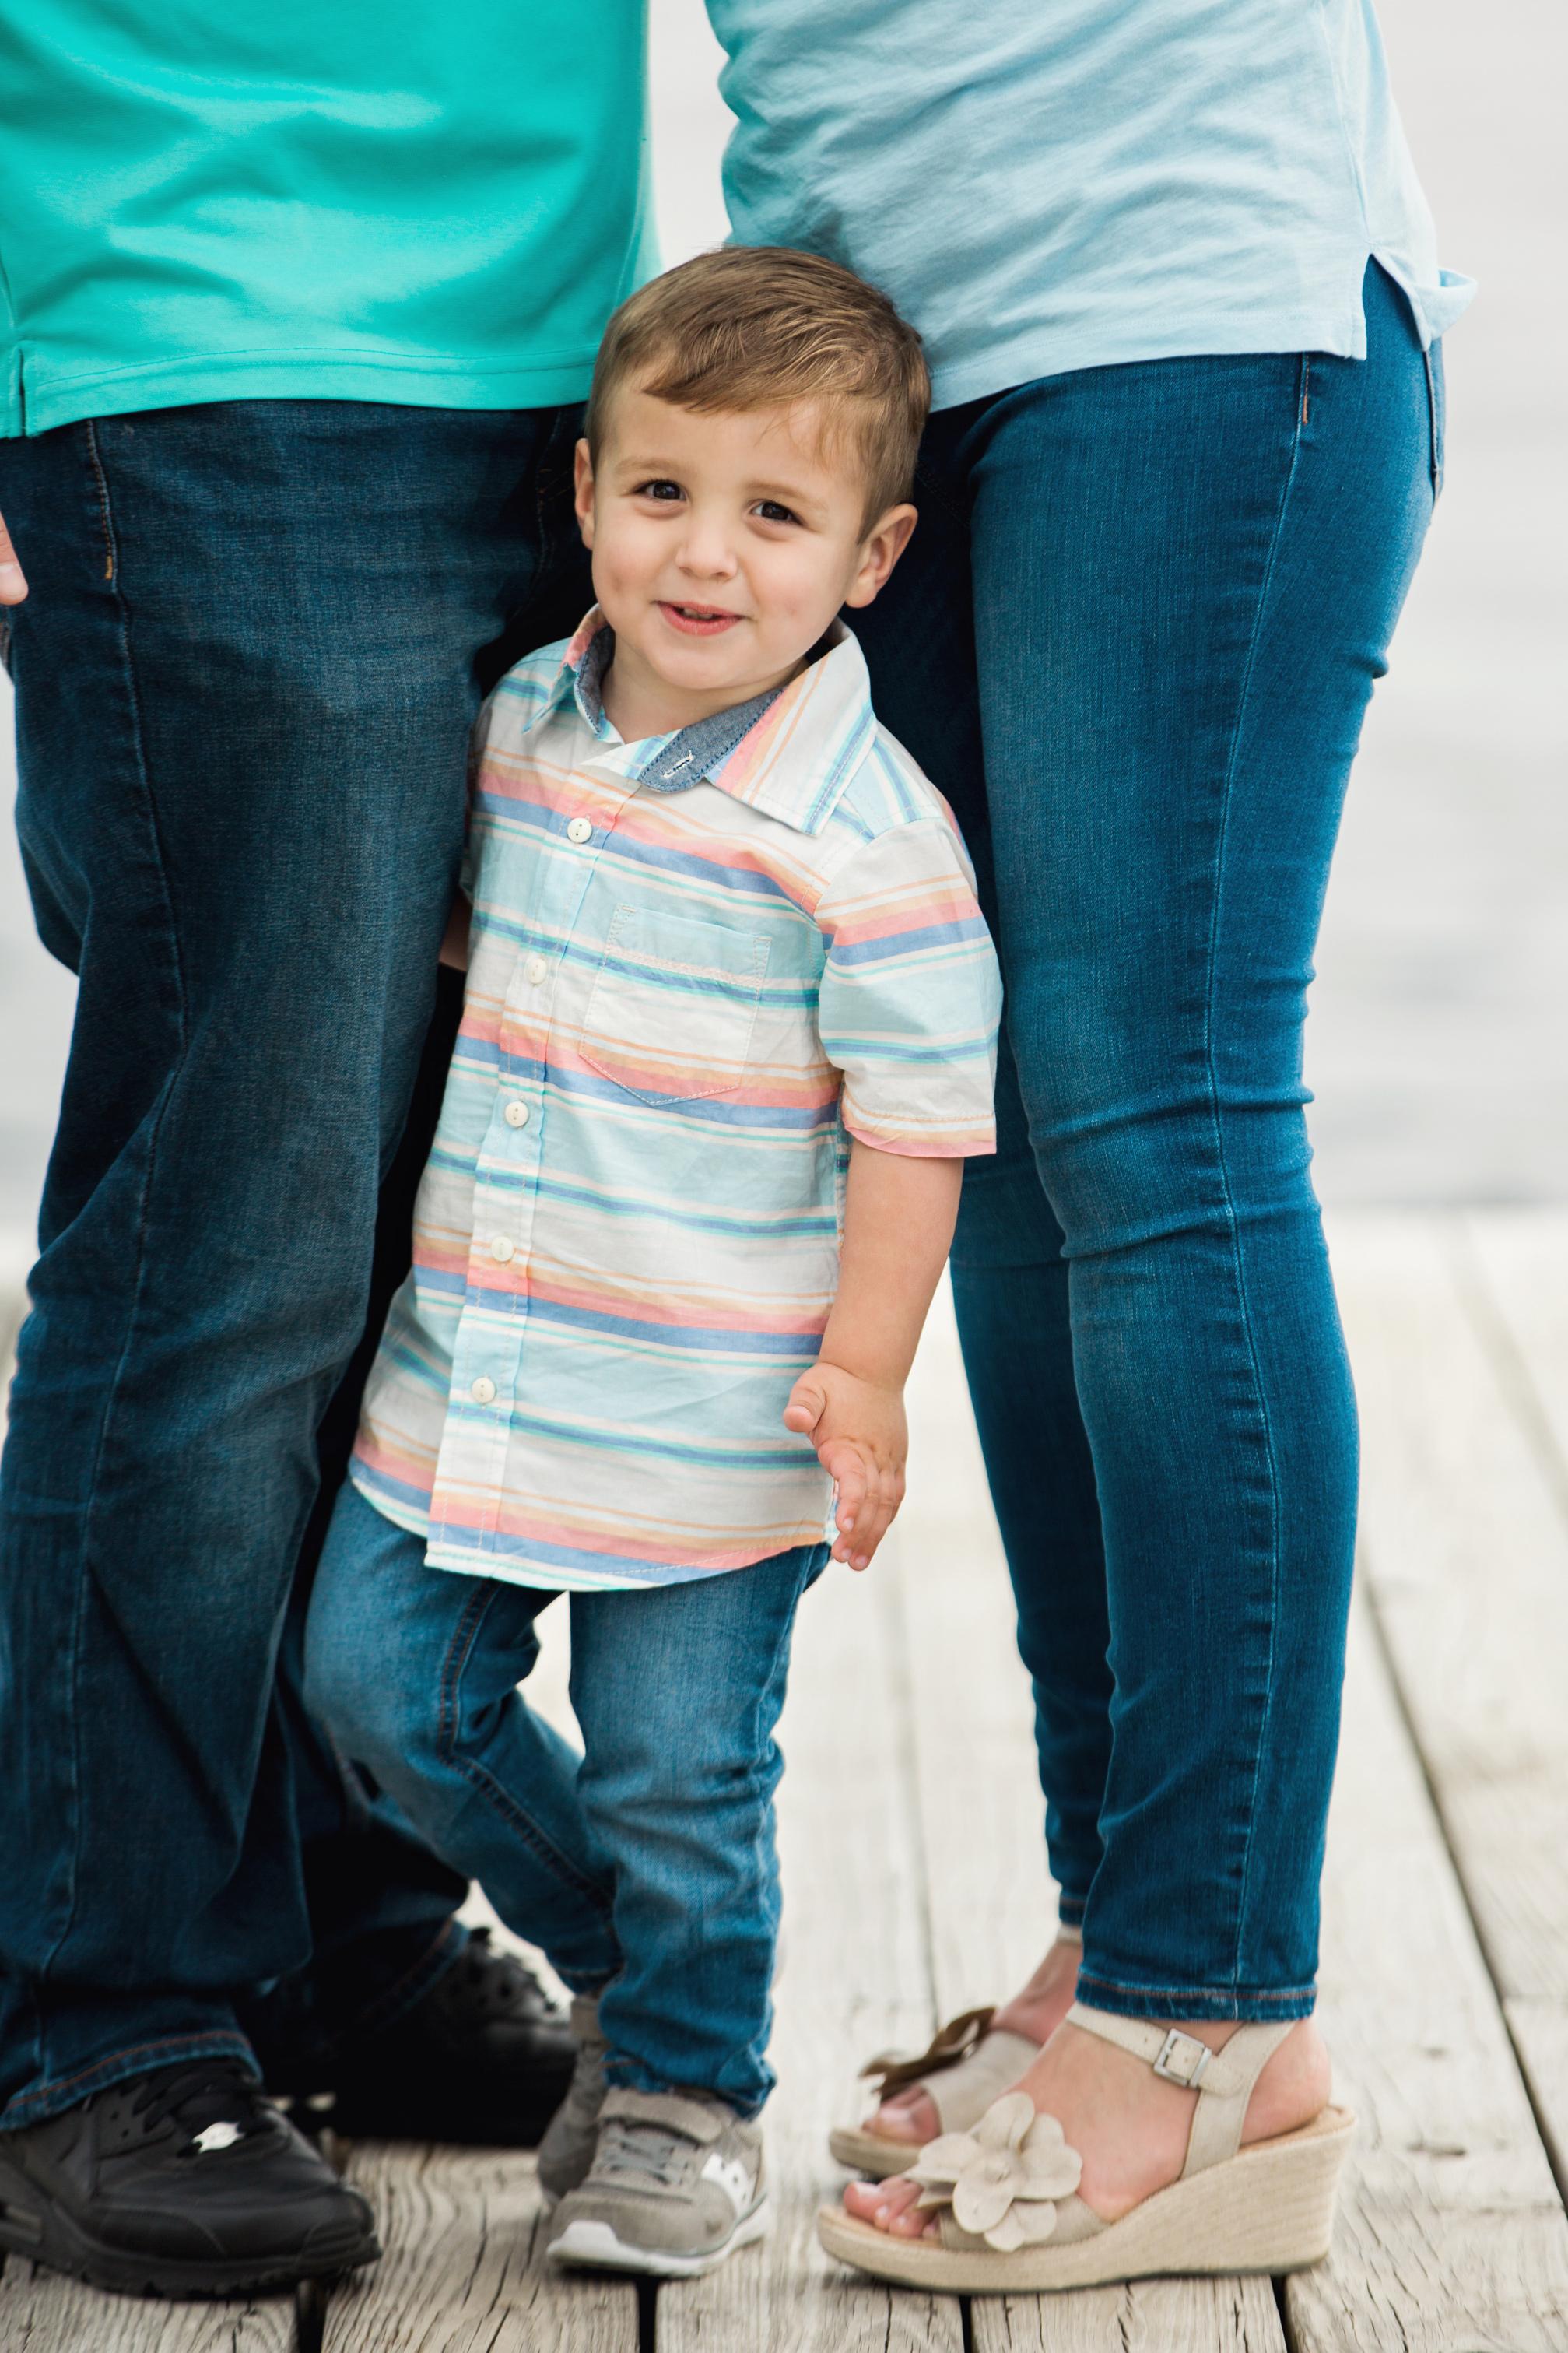 CindyGiovagnoliPhotography_Seattle_Washington_PNW_Family_Childrens_Portraits_Photography-014.jpg